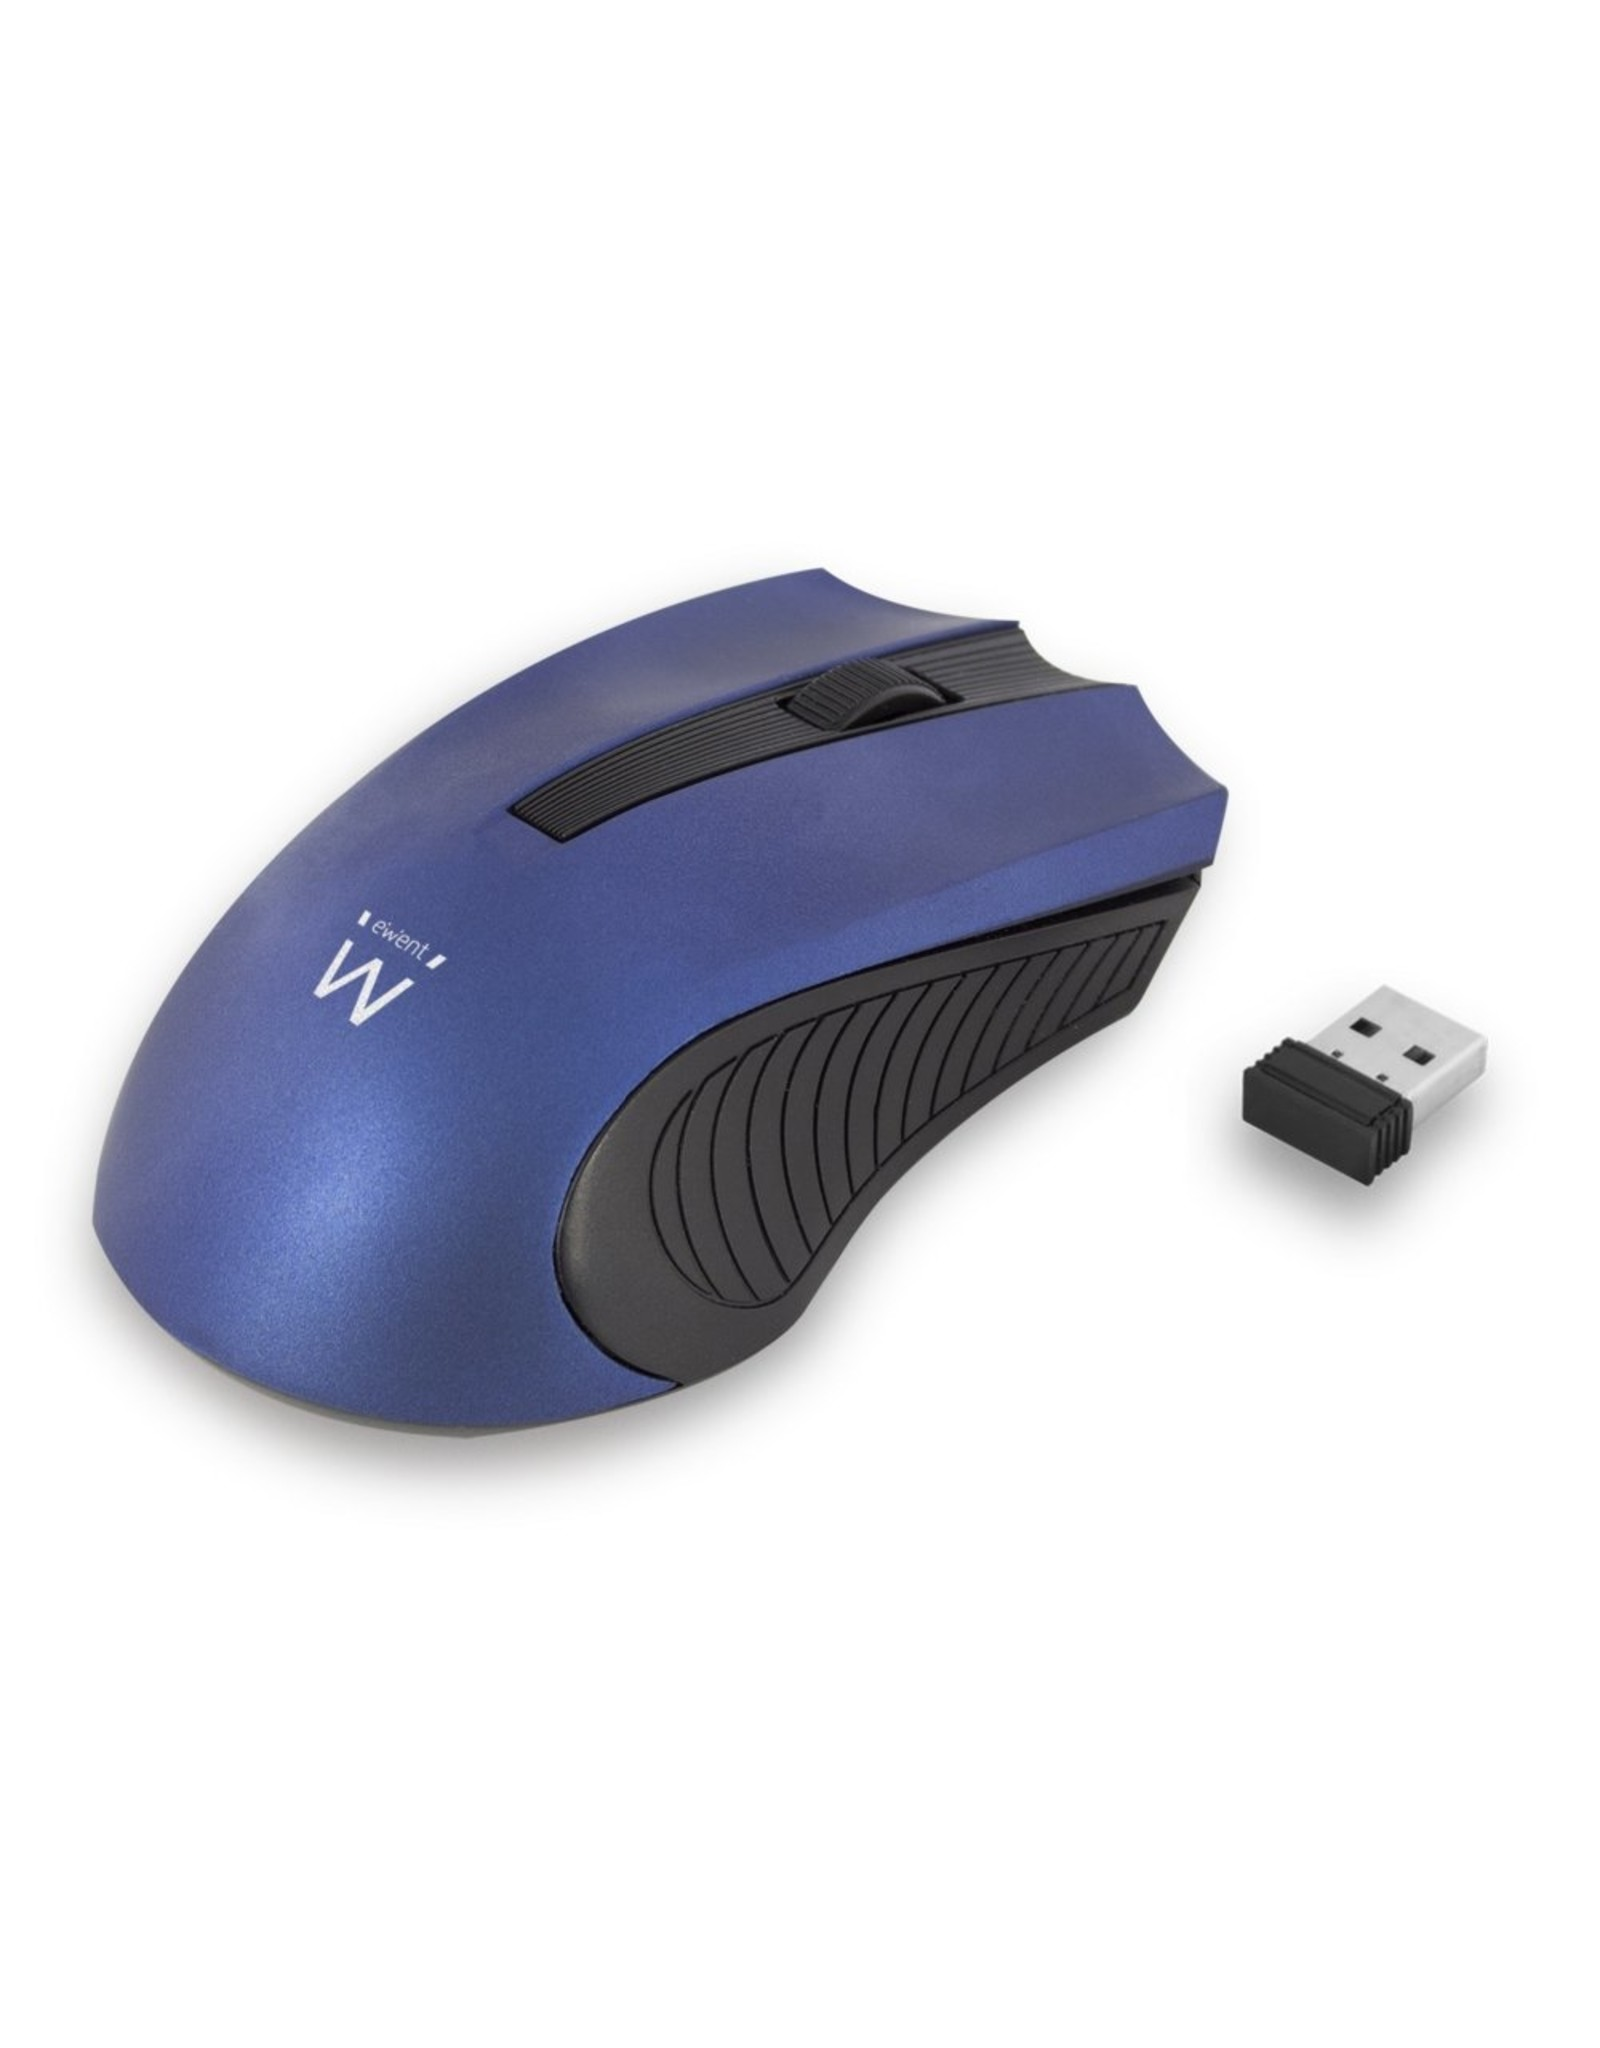 Ewent Wireless mouse blue 1000dpi